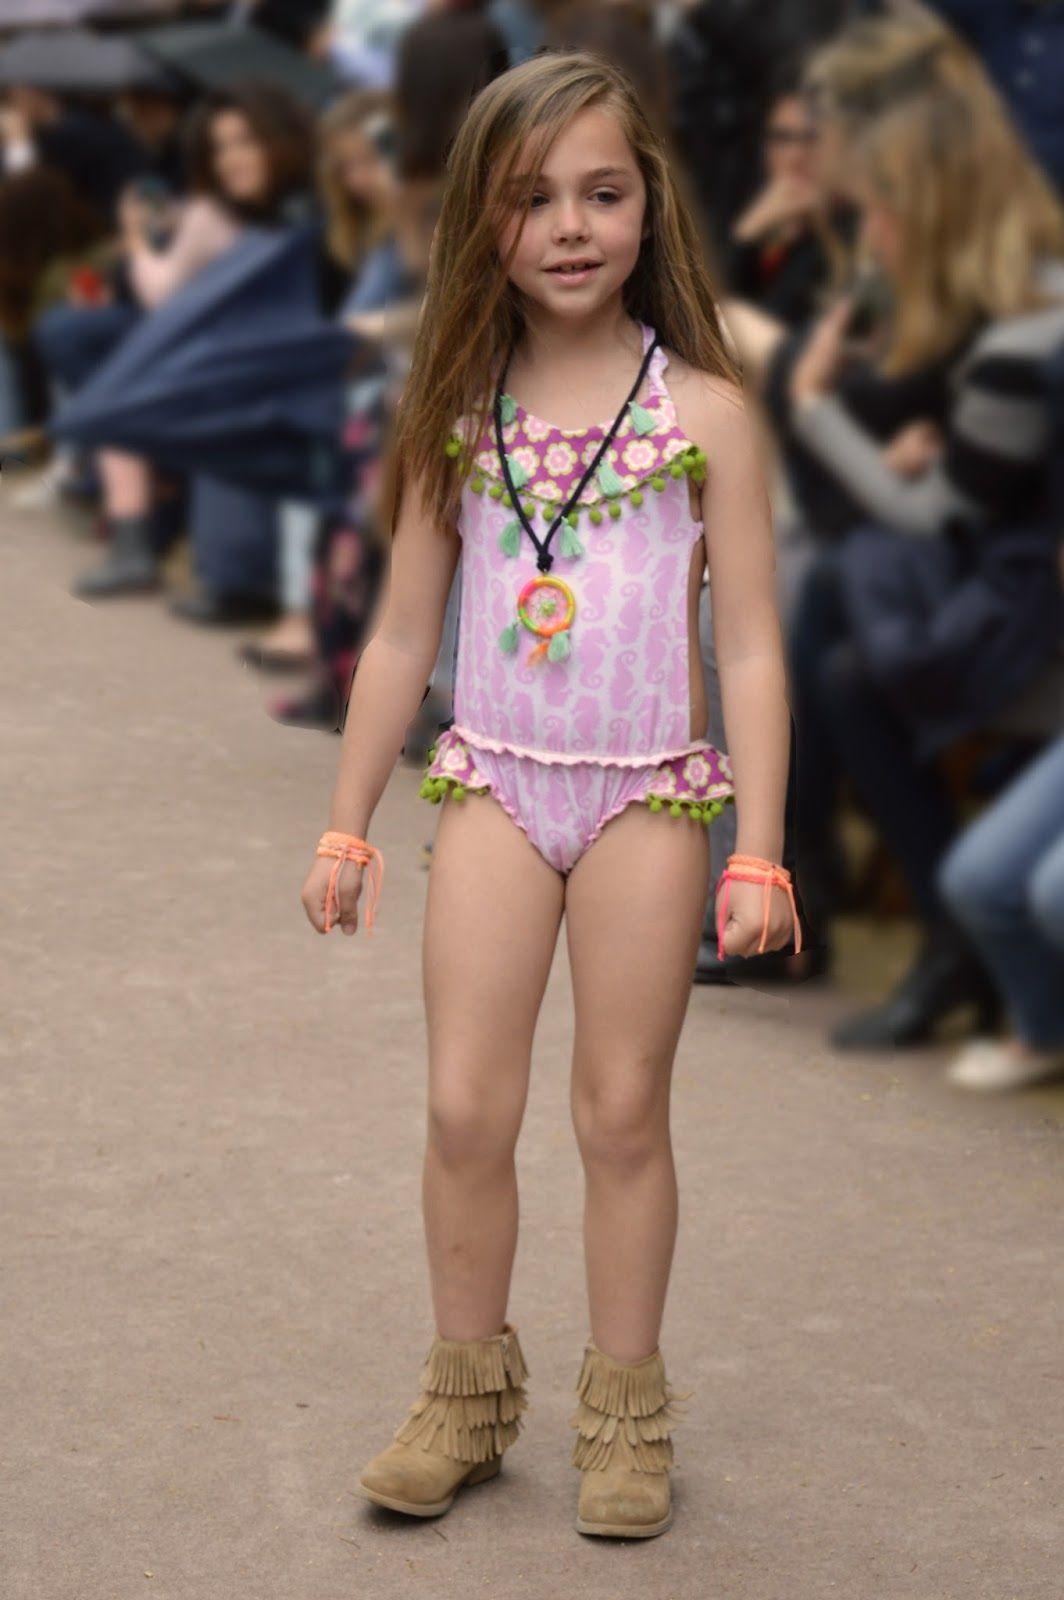 kids girls cameltoe E.T.N.A. by #ElenaTablada #modabaño #modaniña #PequeñaFashionista  #ropadebaño #kidgirl #swimwear #littlefashionistascloset #summerwardrobe  #ETNA #beachwear